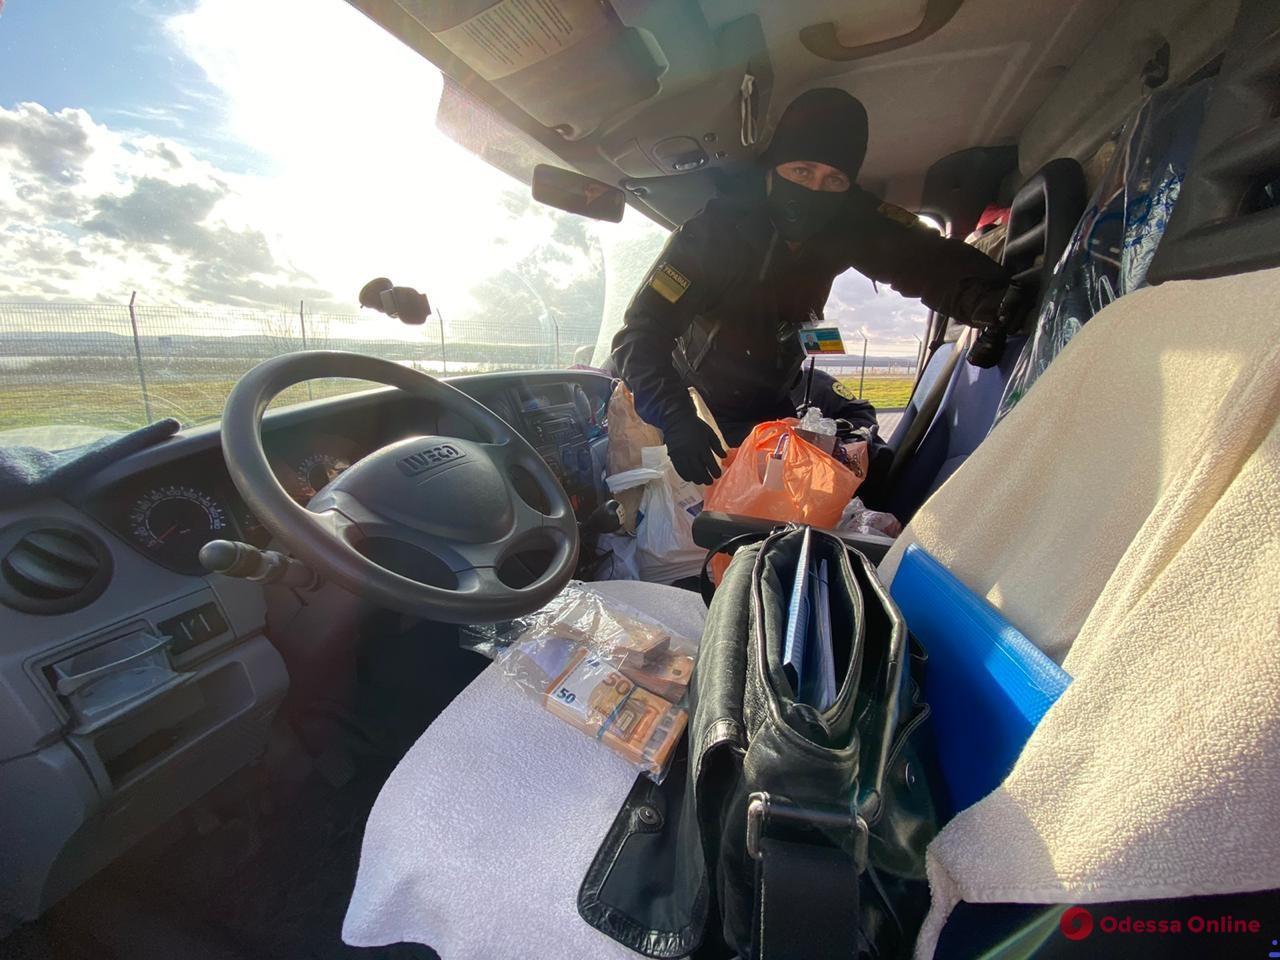 пограничники в кабине грузовика